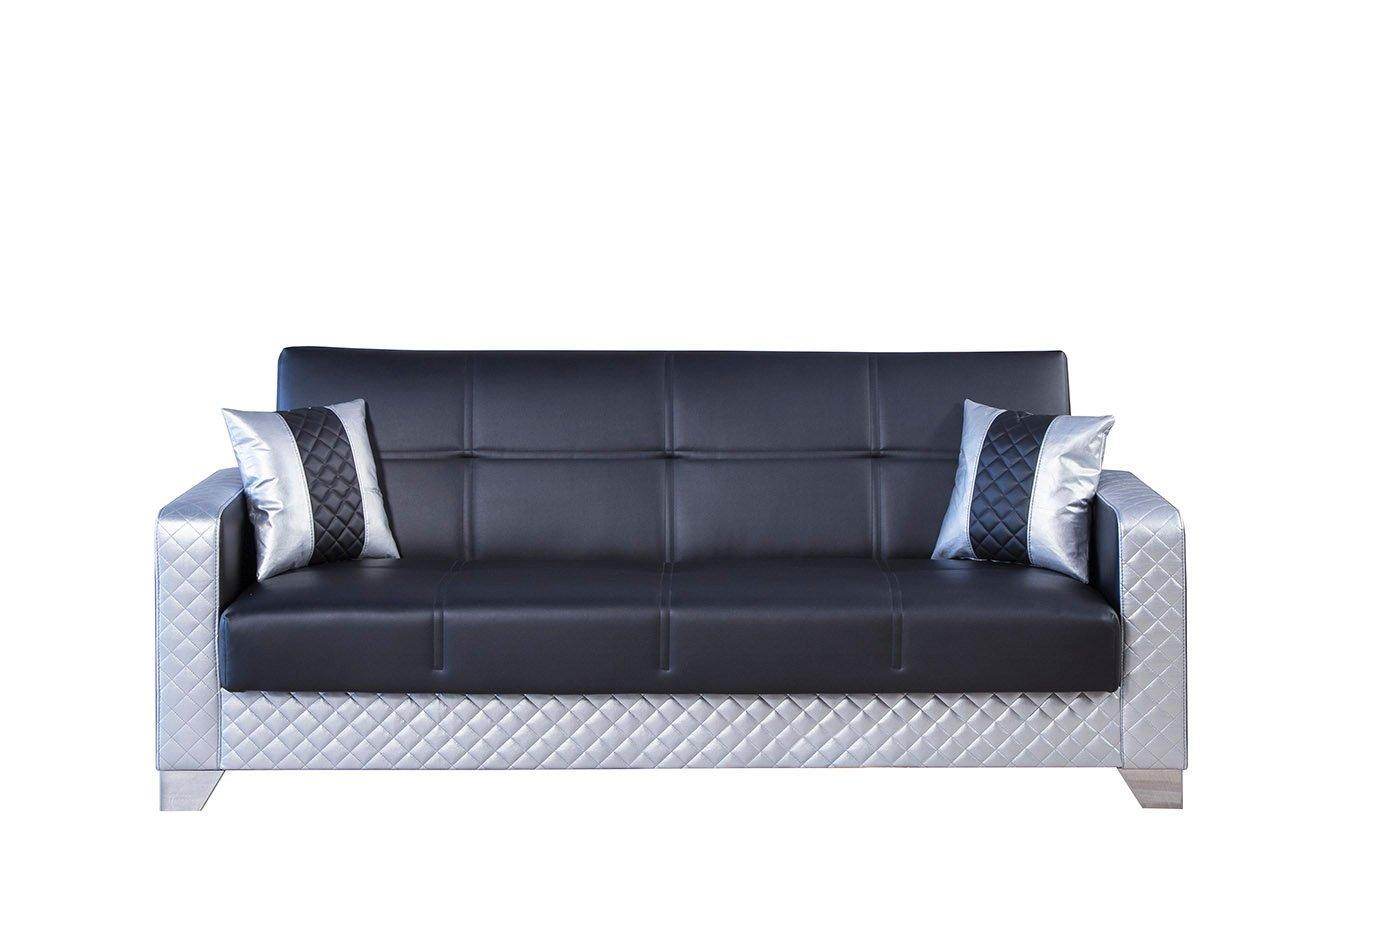 Maximum Value Black Silver Convertible Sofa By Casamode